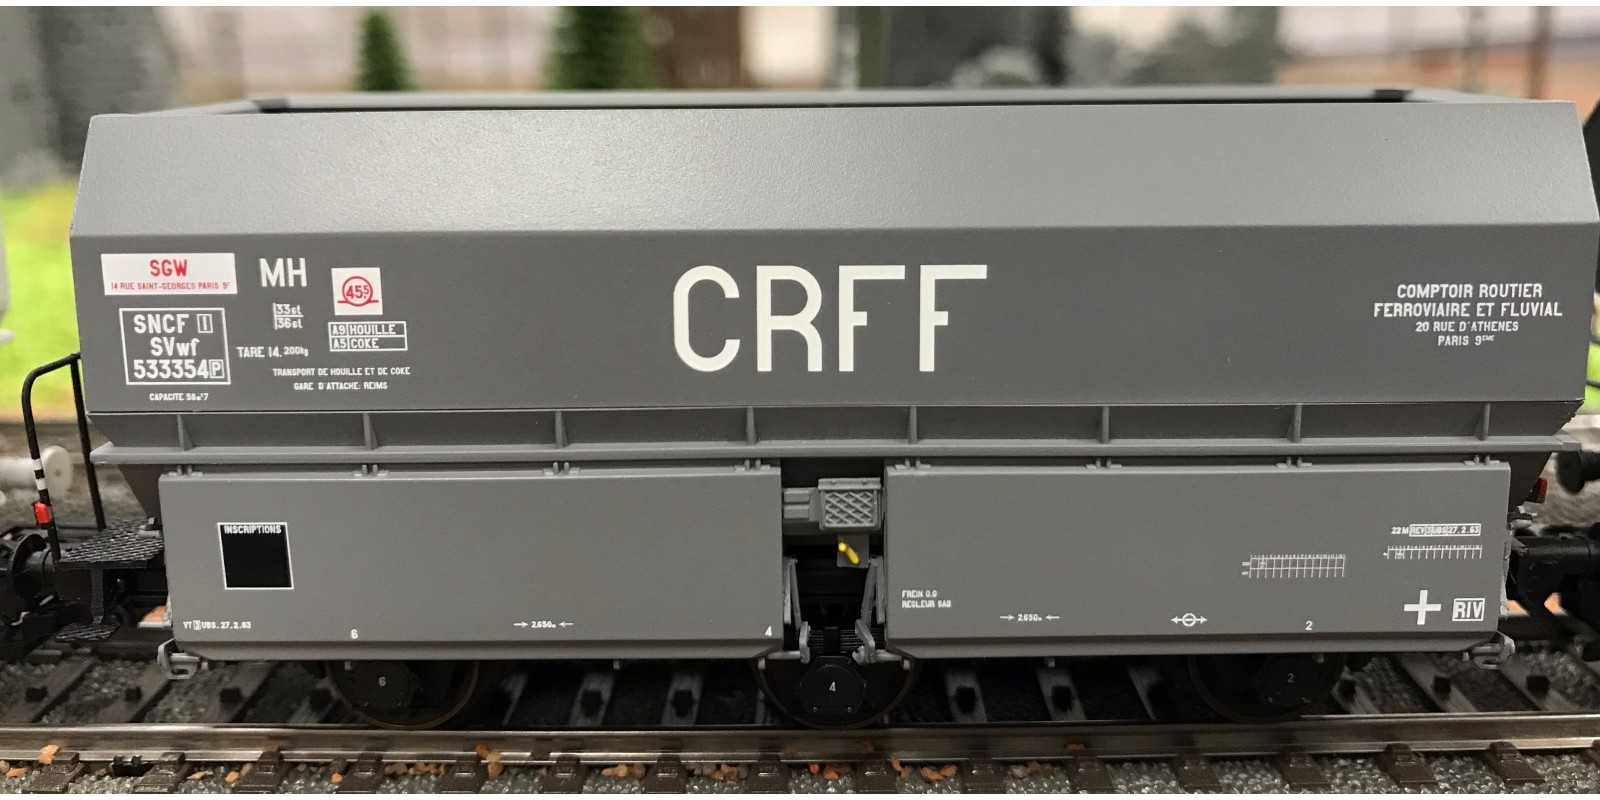 "REWB375 COKE MH45 ""Léonard"" Wheels, 3 axles wheels ""CRFF"" Grey, black Frame Era III"